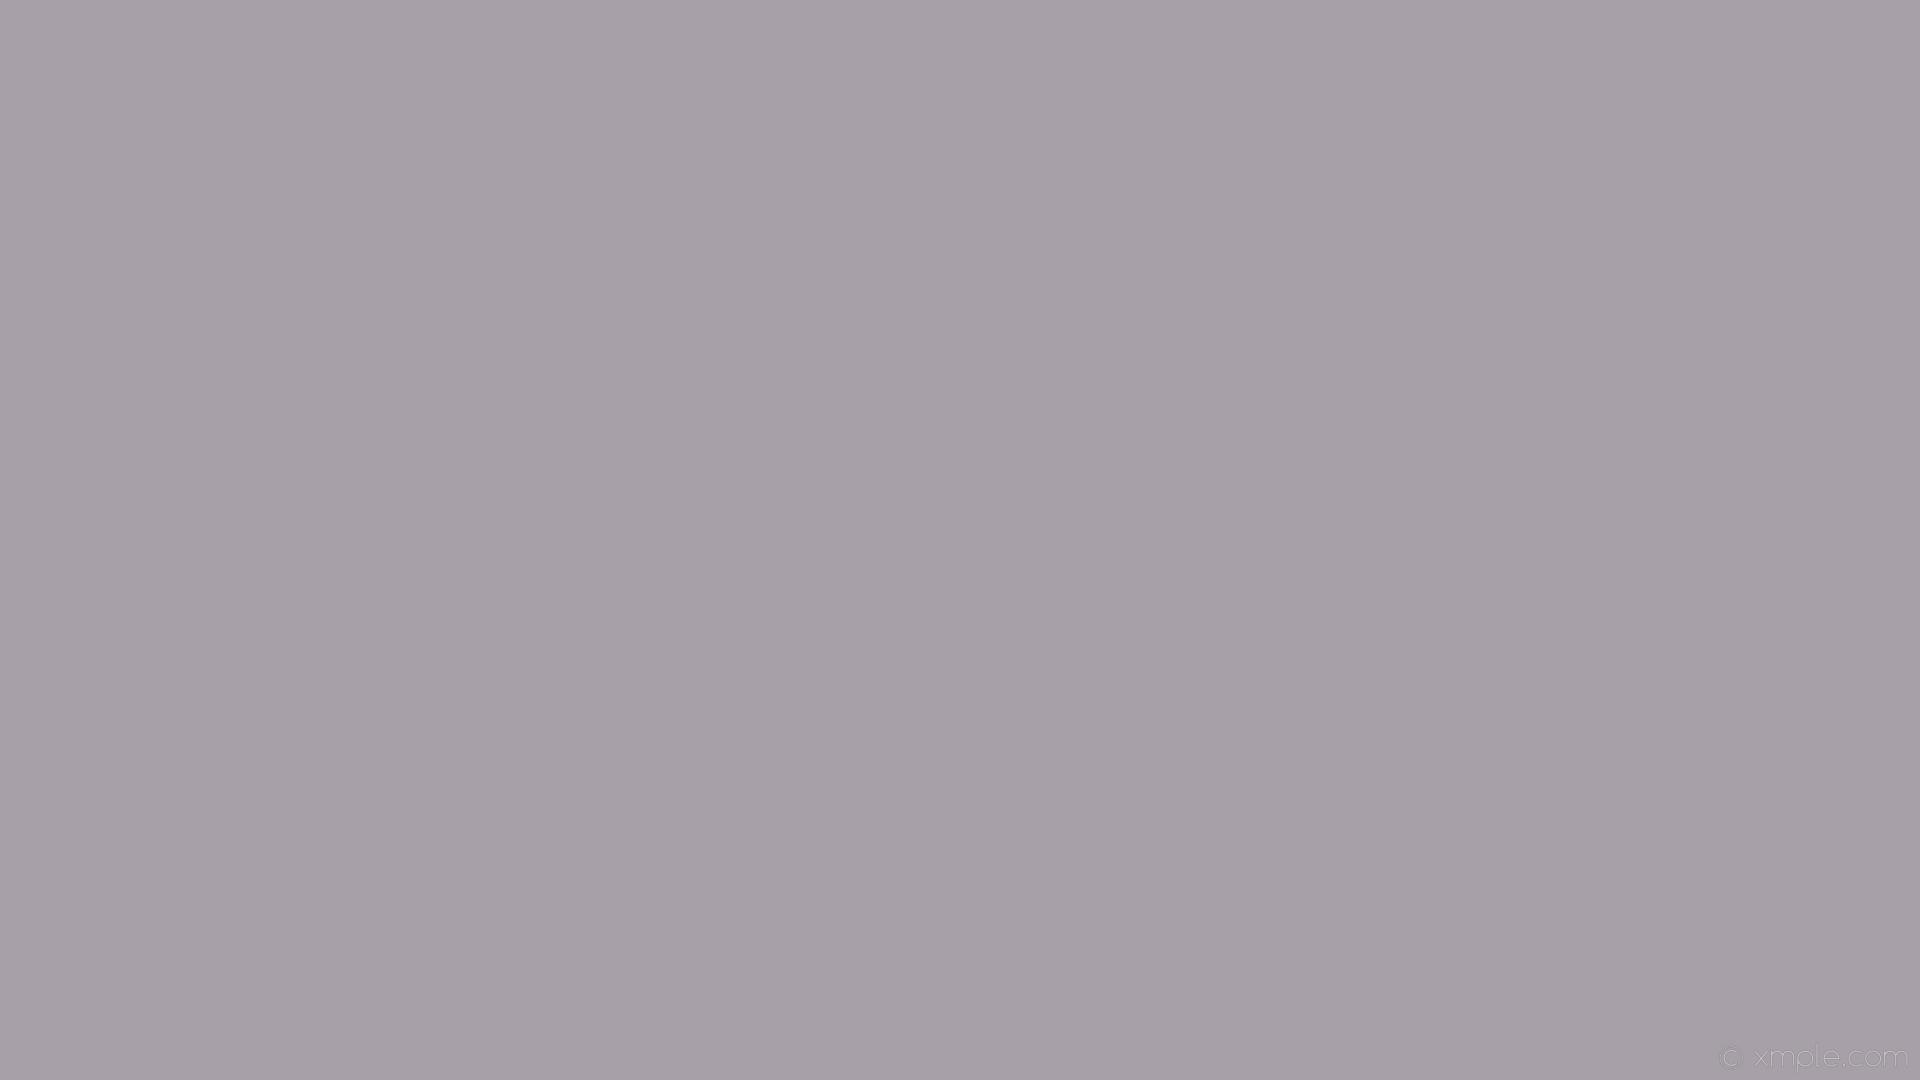 wallpaper solid color gray plain one colour single #a7a0a8